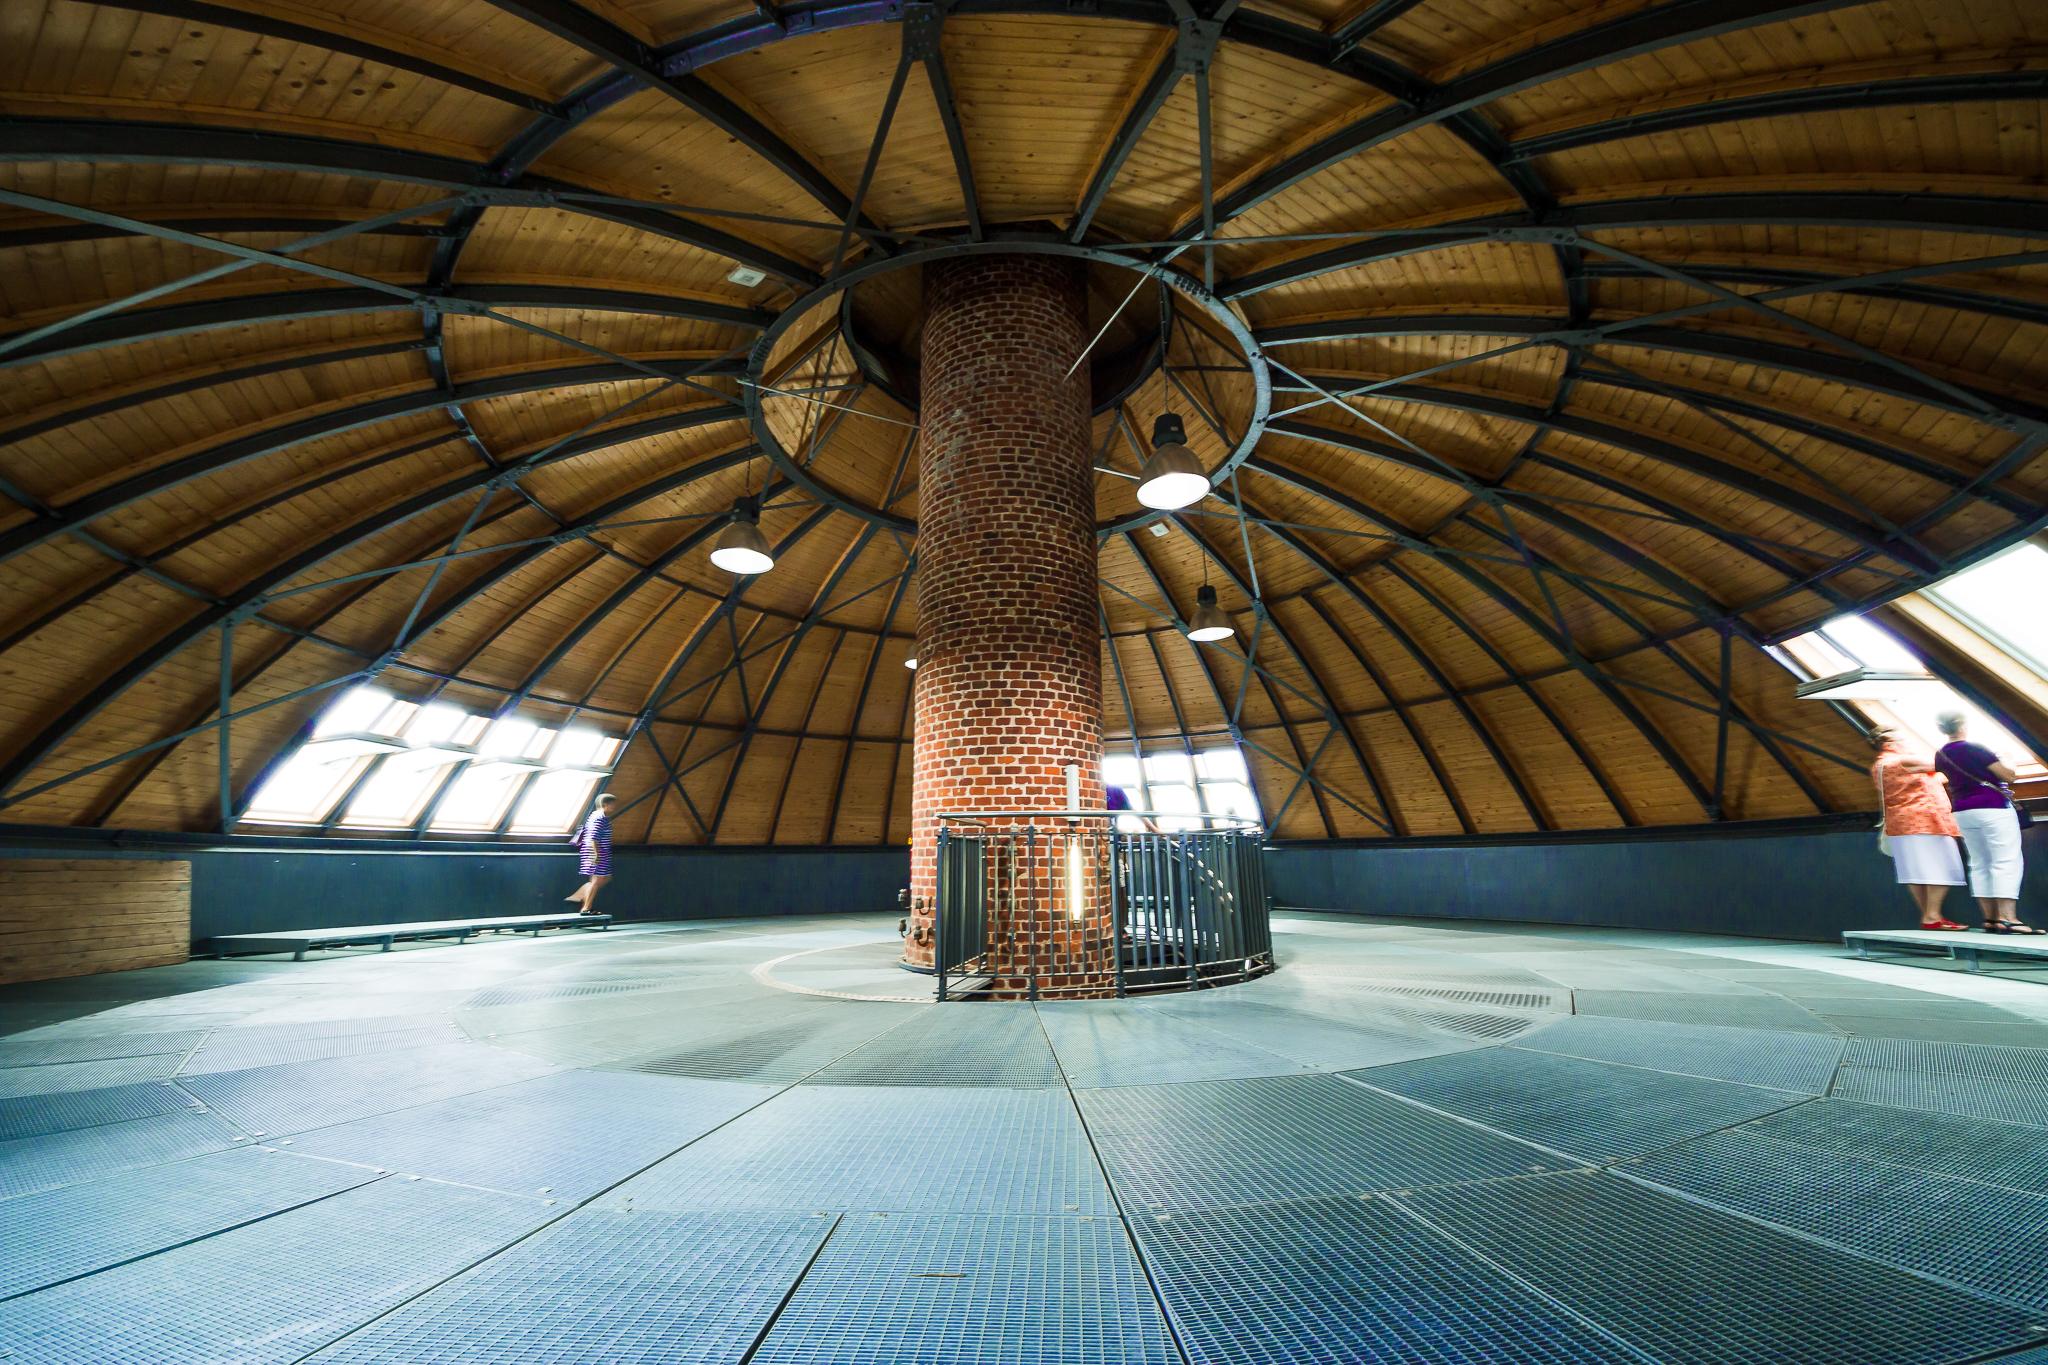 die Kuppel des H2o-Turmparks